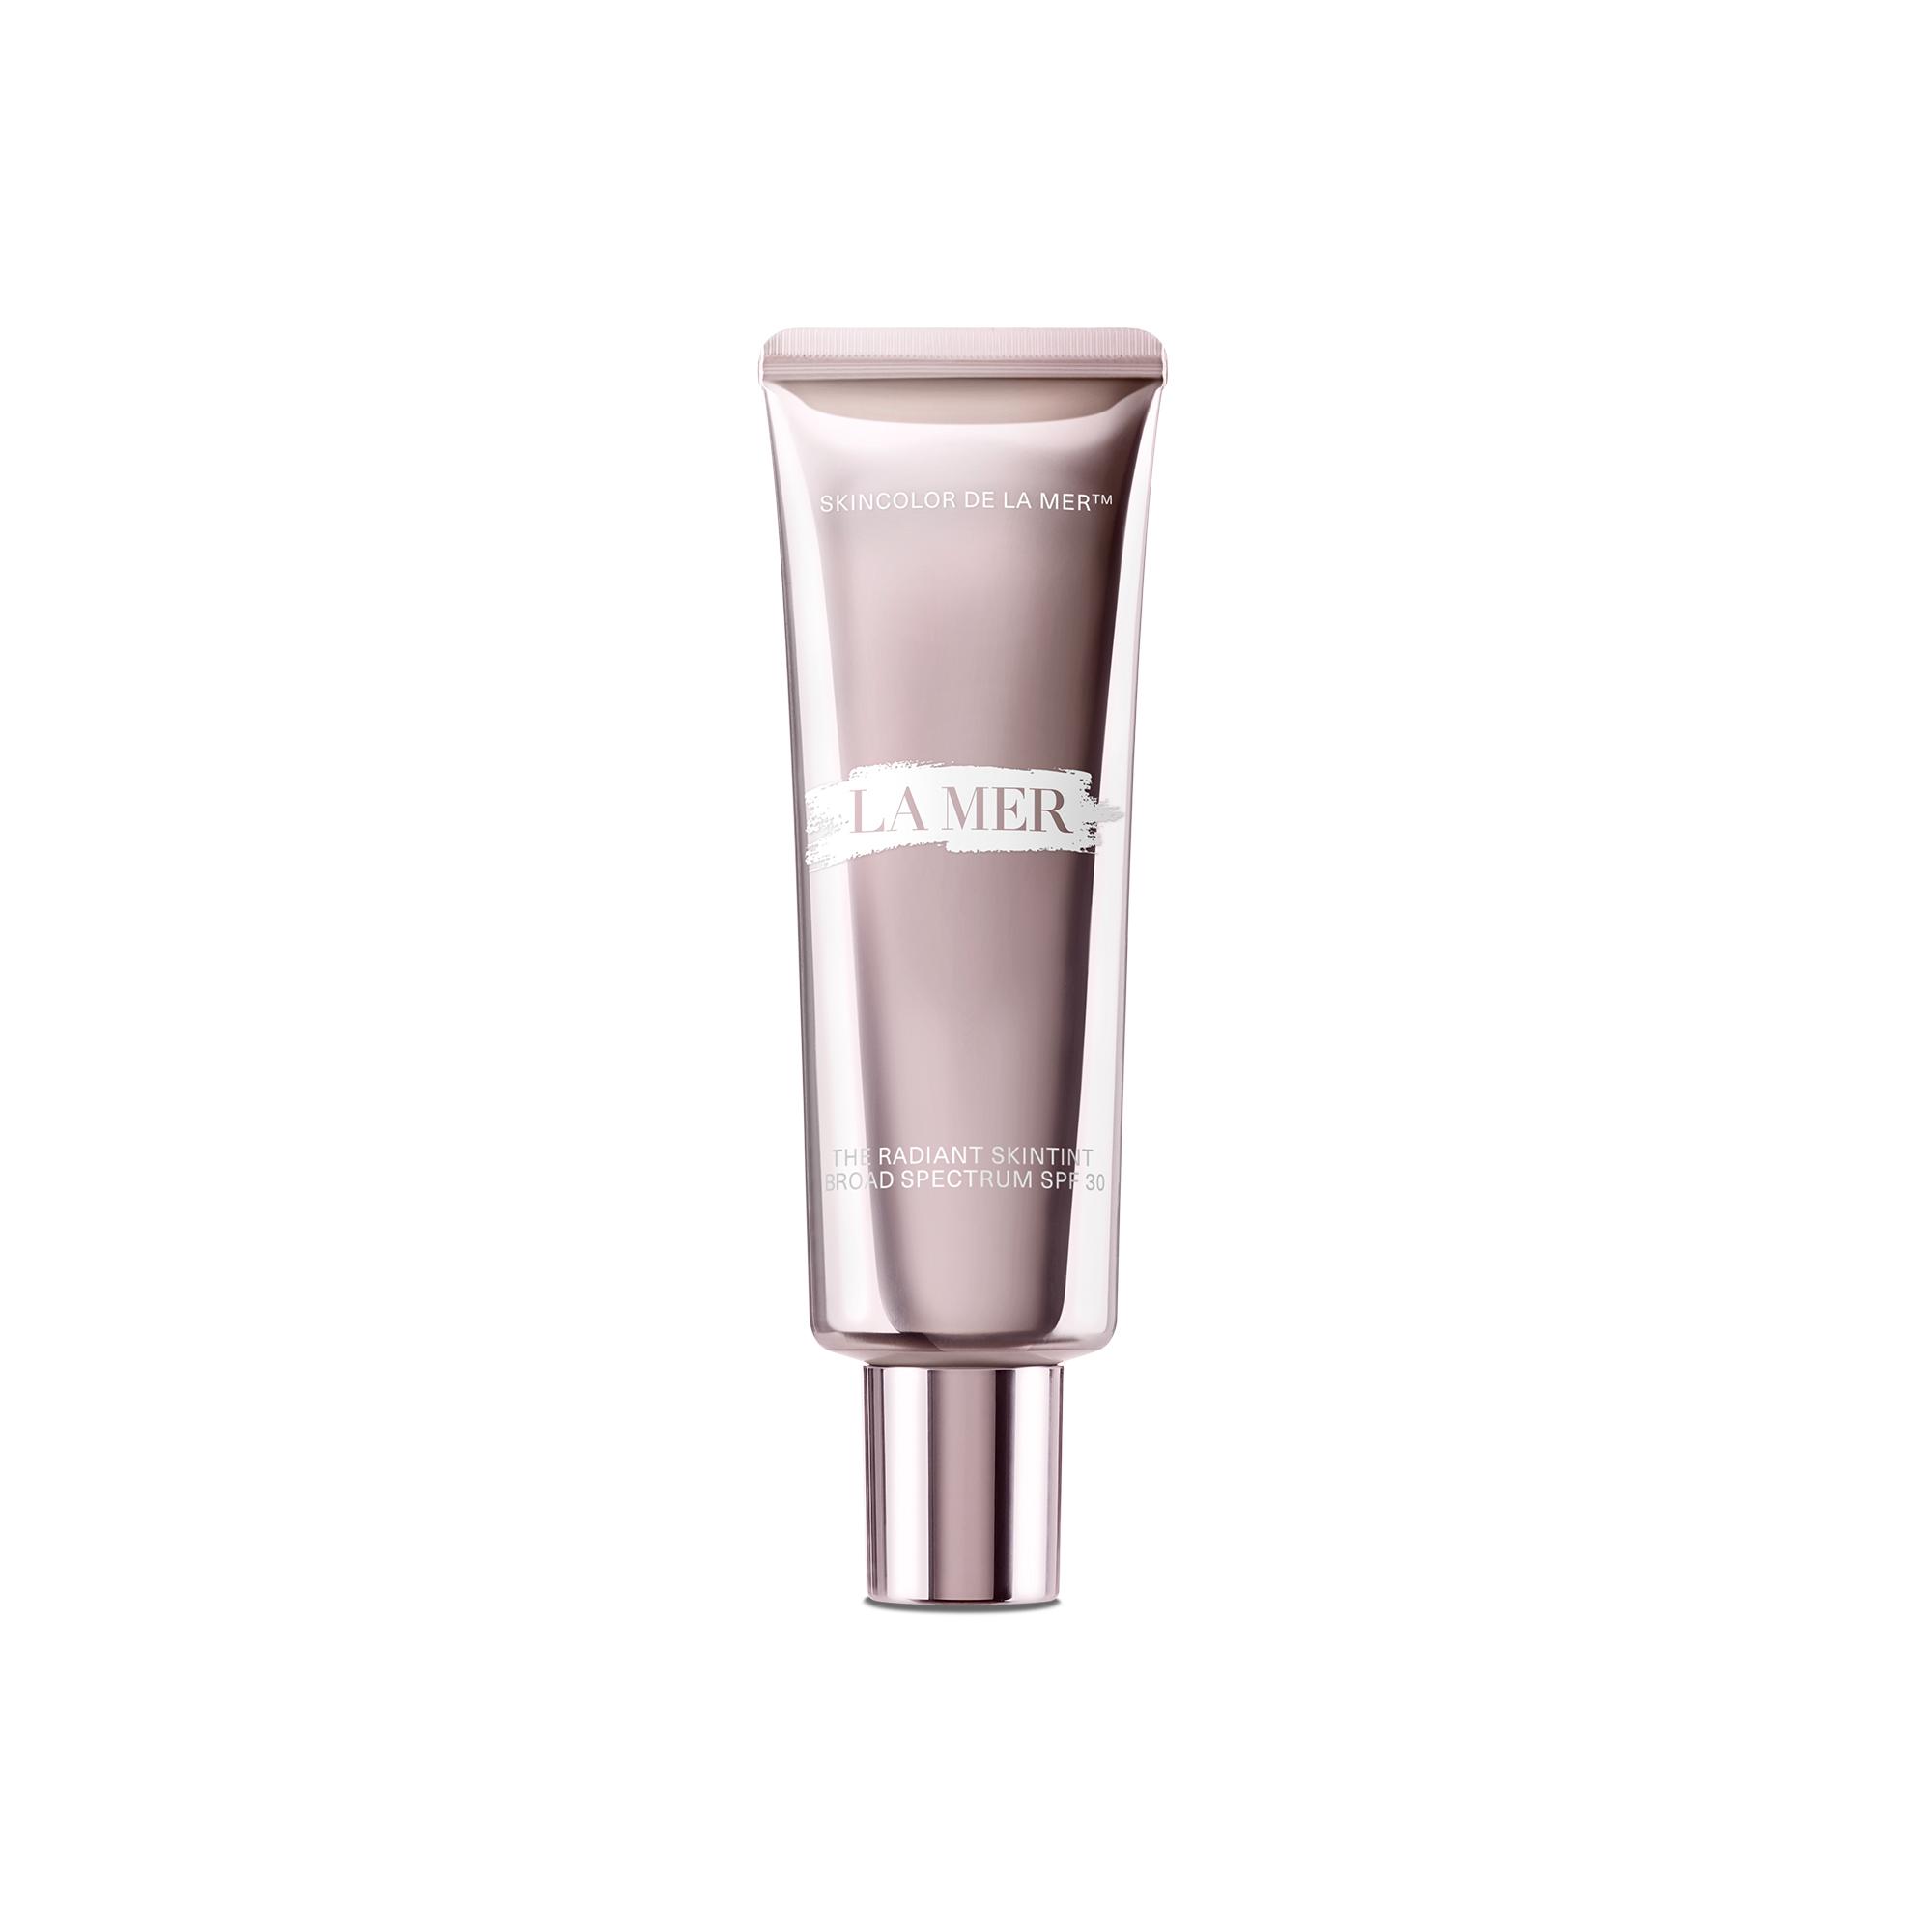 La Mer The Radiant Skin Tint SPF30, fair